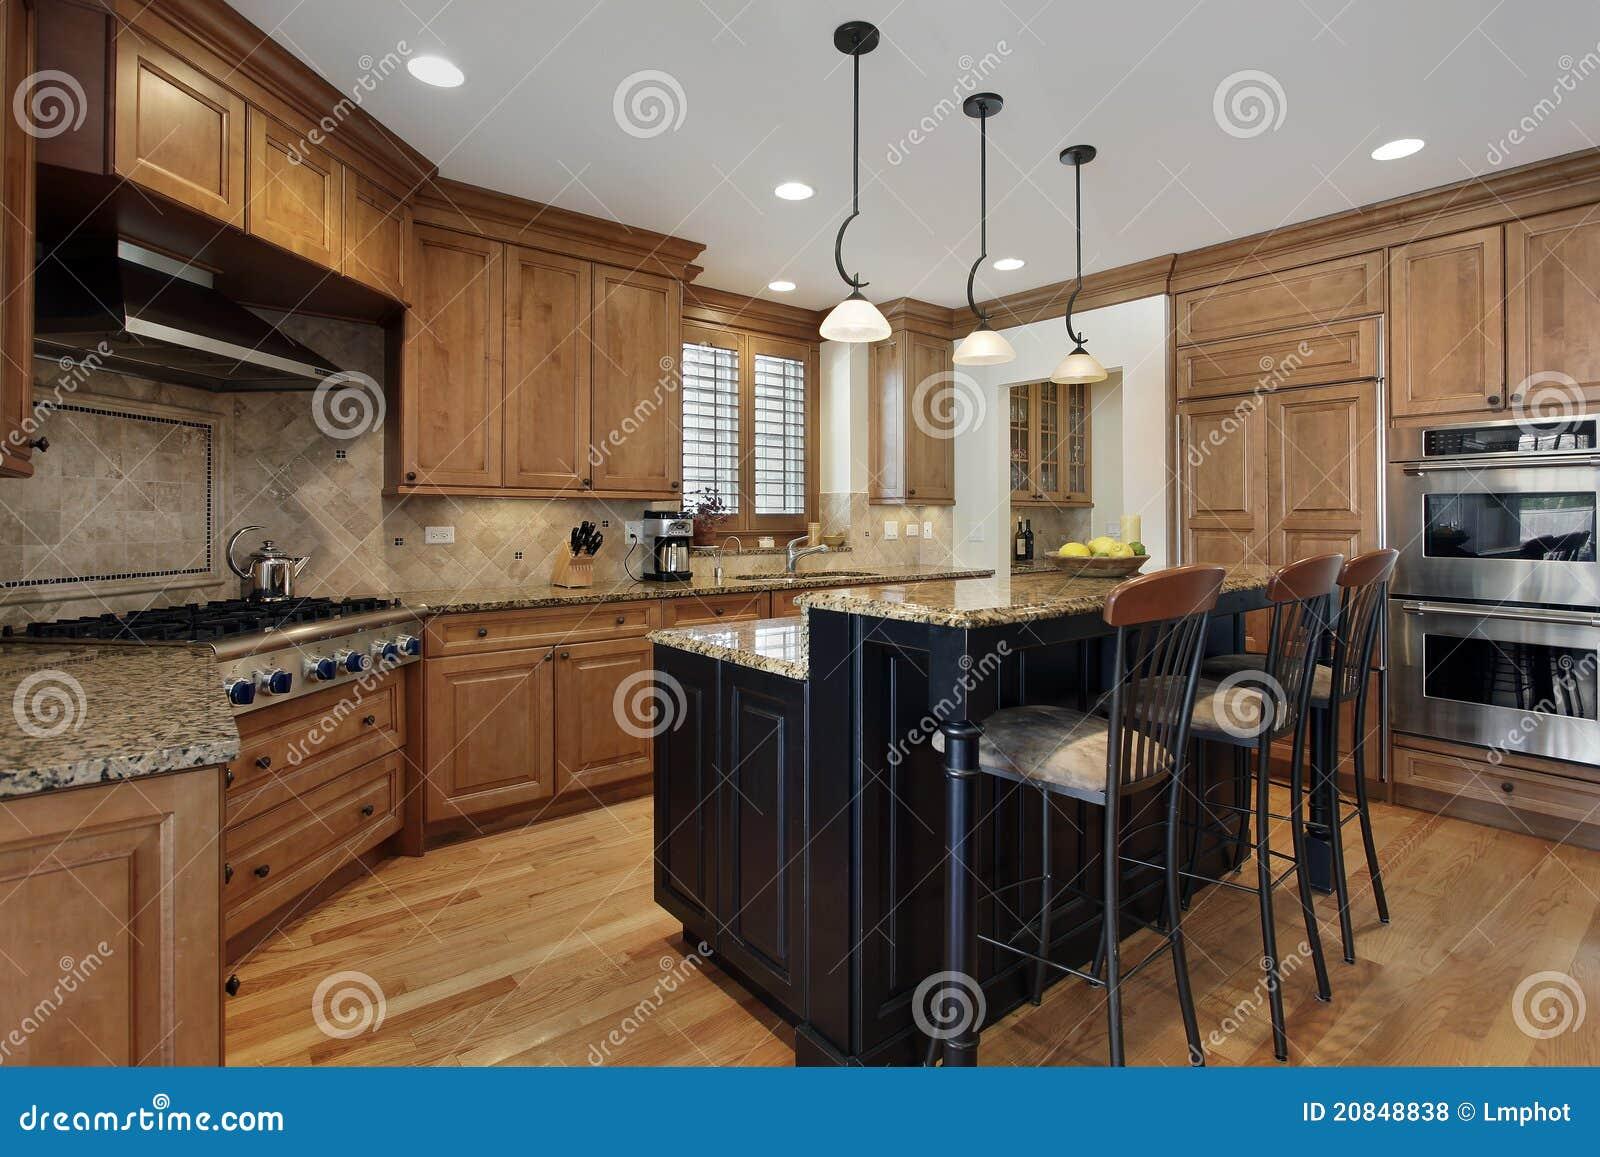 luxury kitchen with granite island royalty free stock